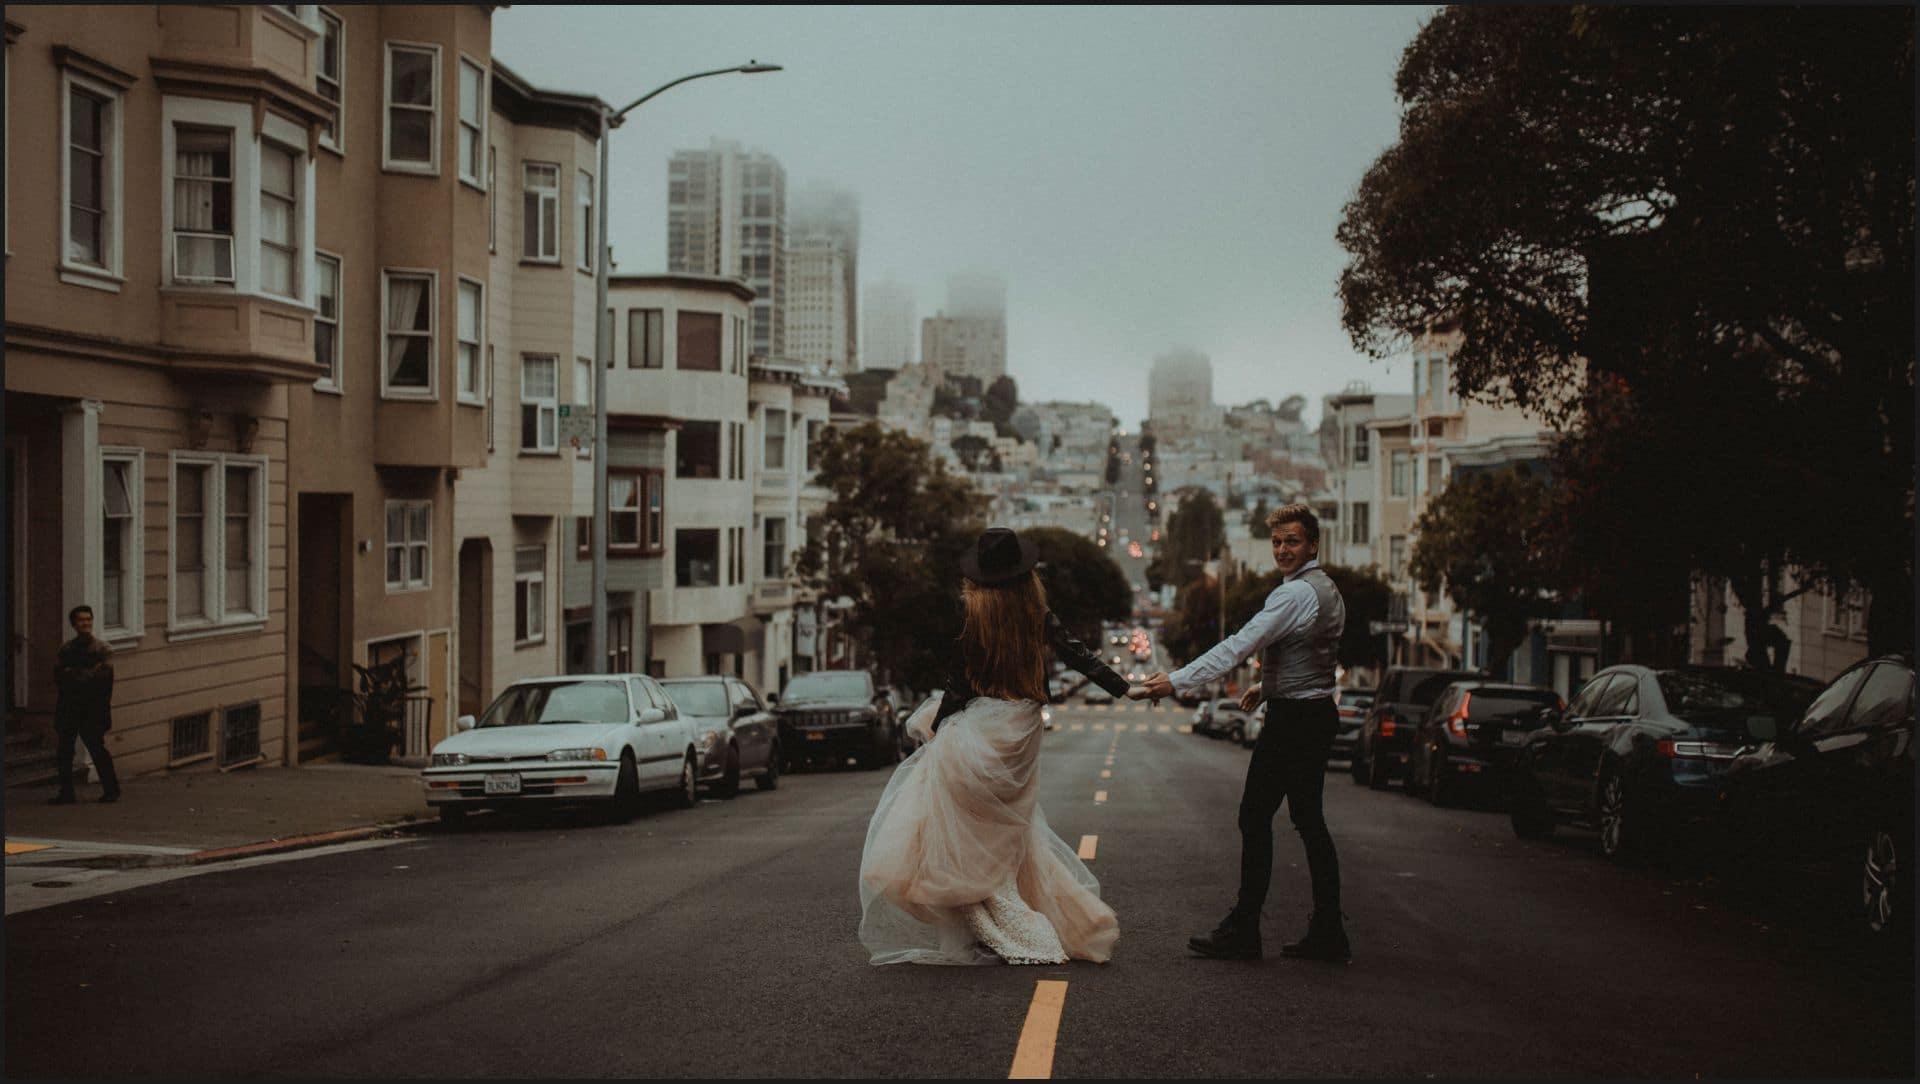 san francisco, california, elopement wedding, bride, groom, road, hand